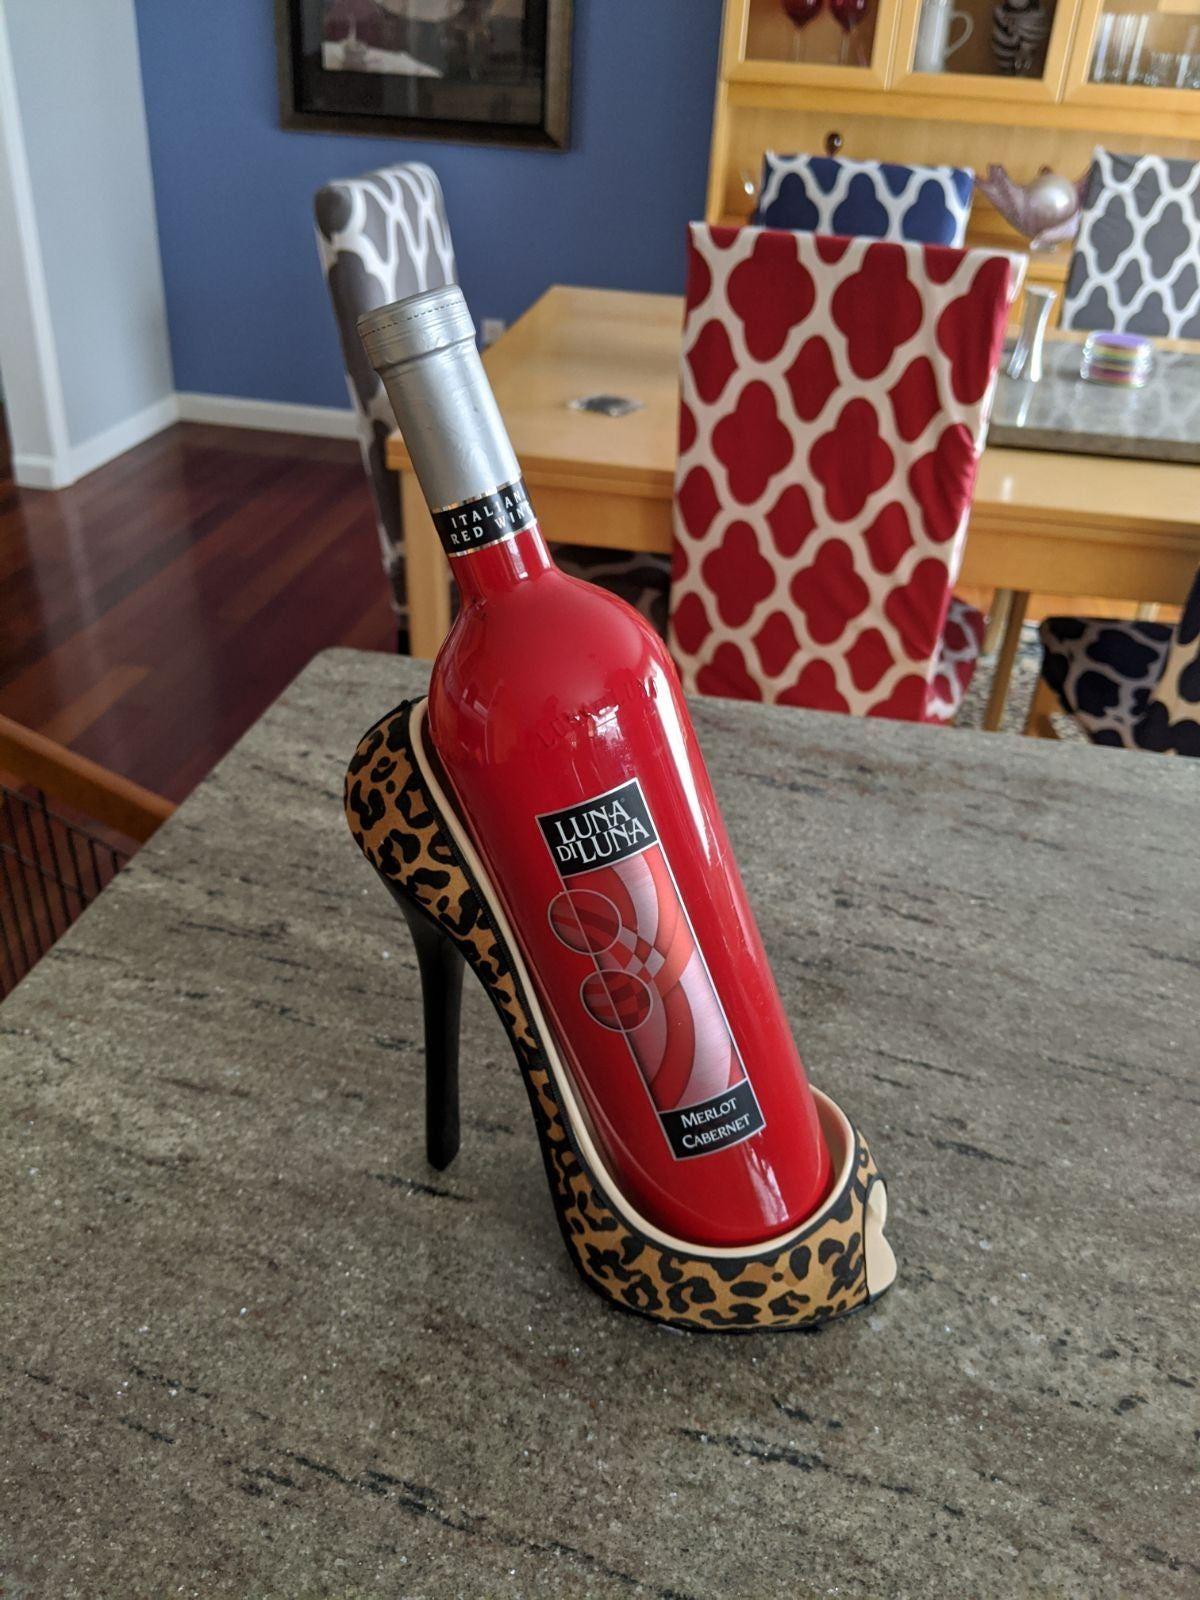 Wine Holder In 2020 Wine Holder Holder Wine